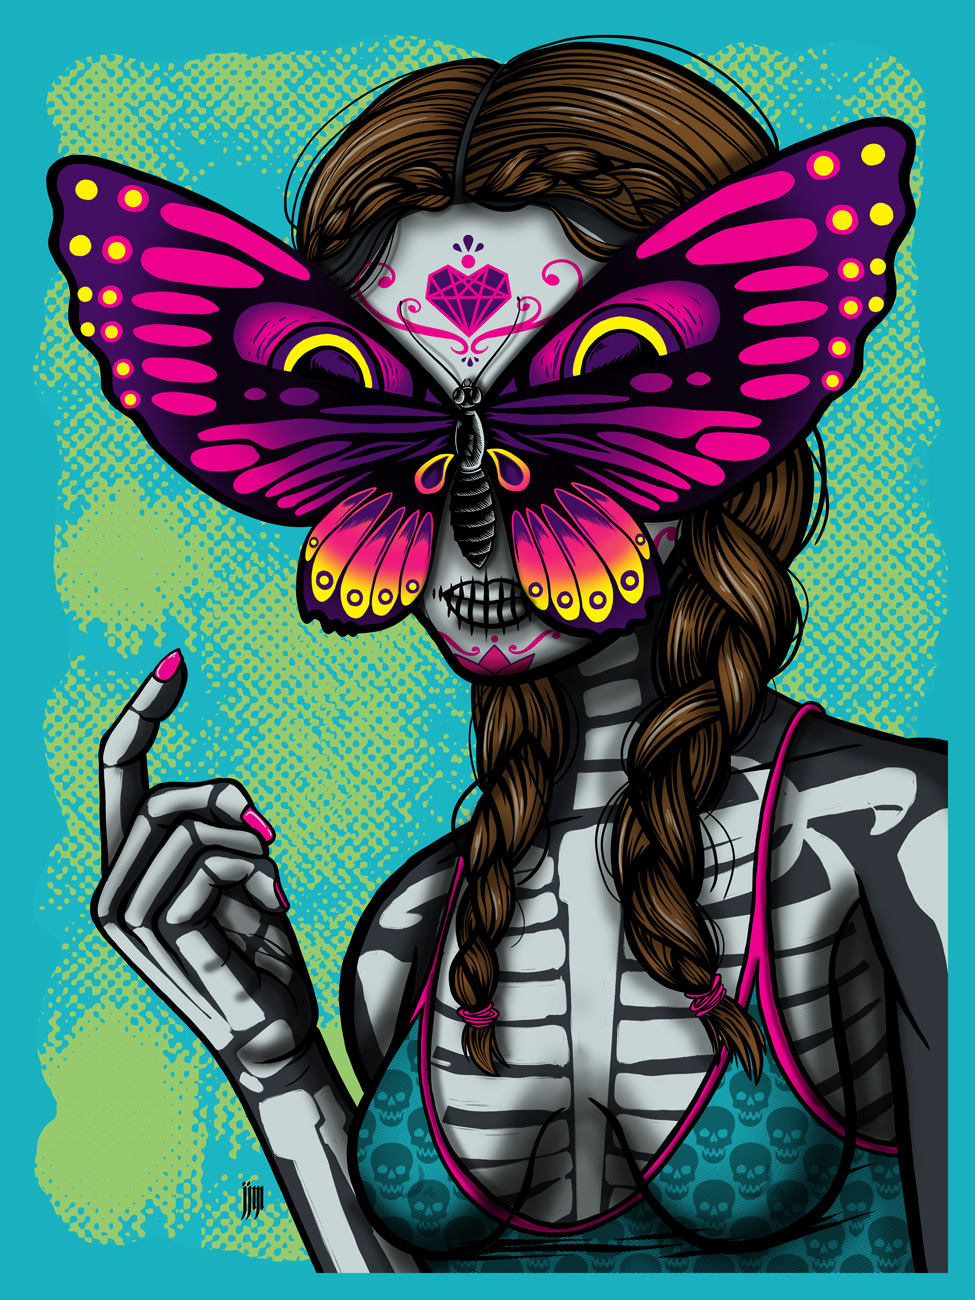 Mable Mariposa